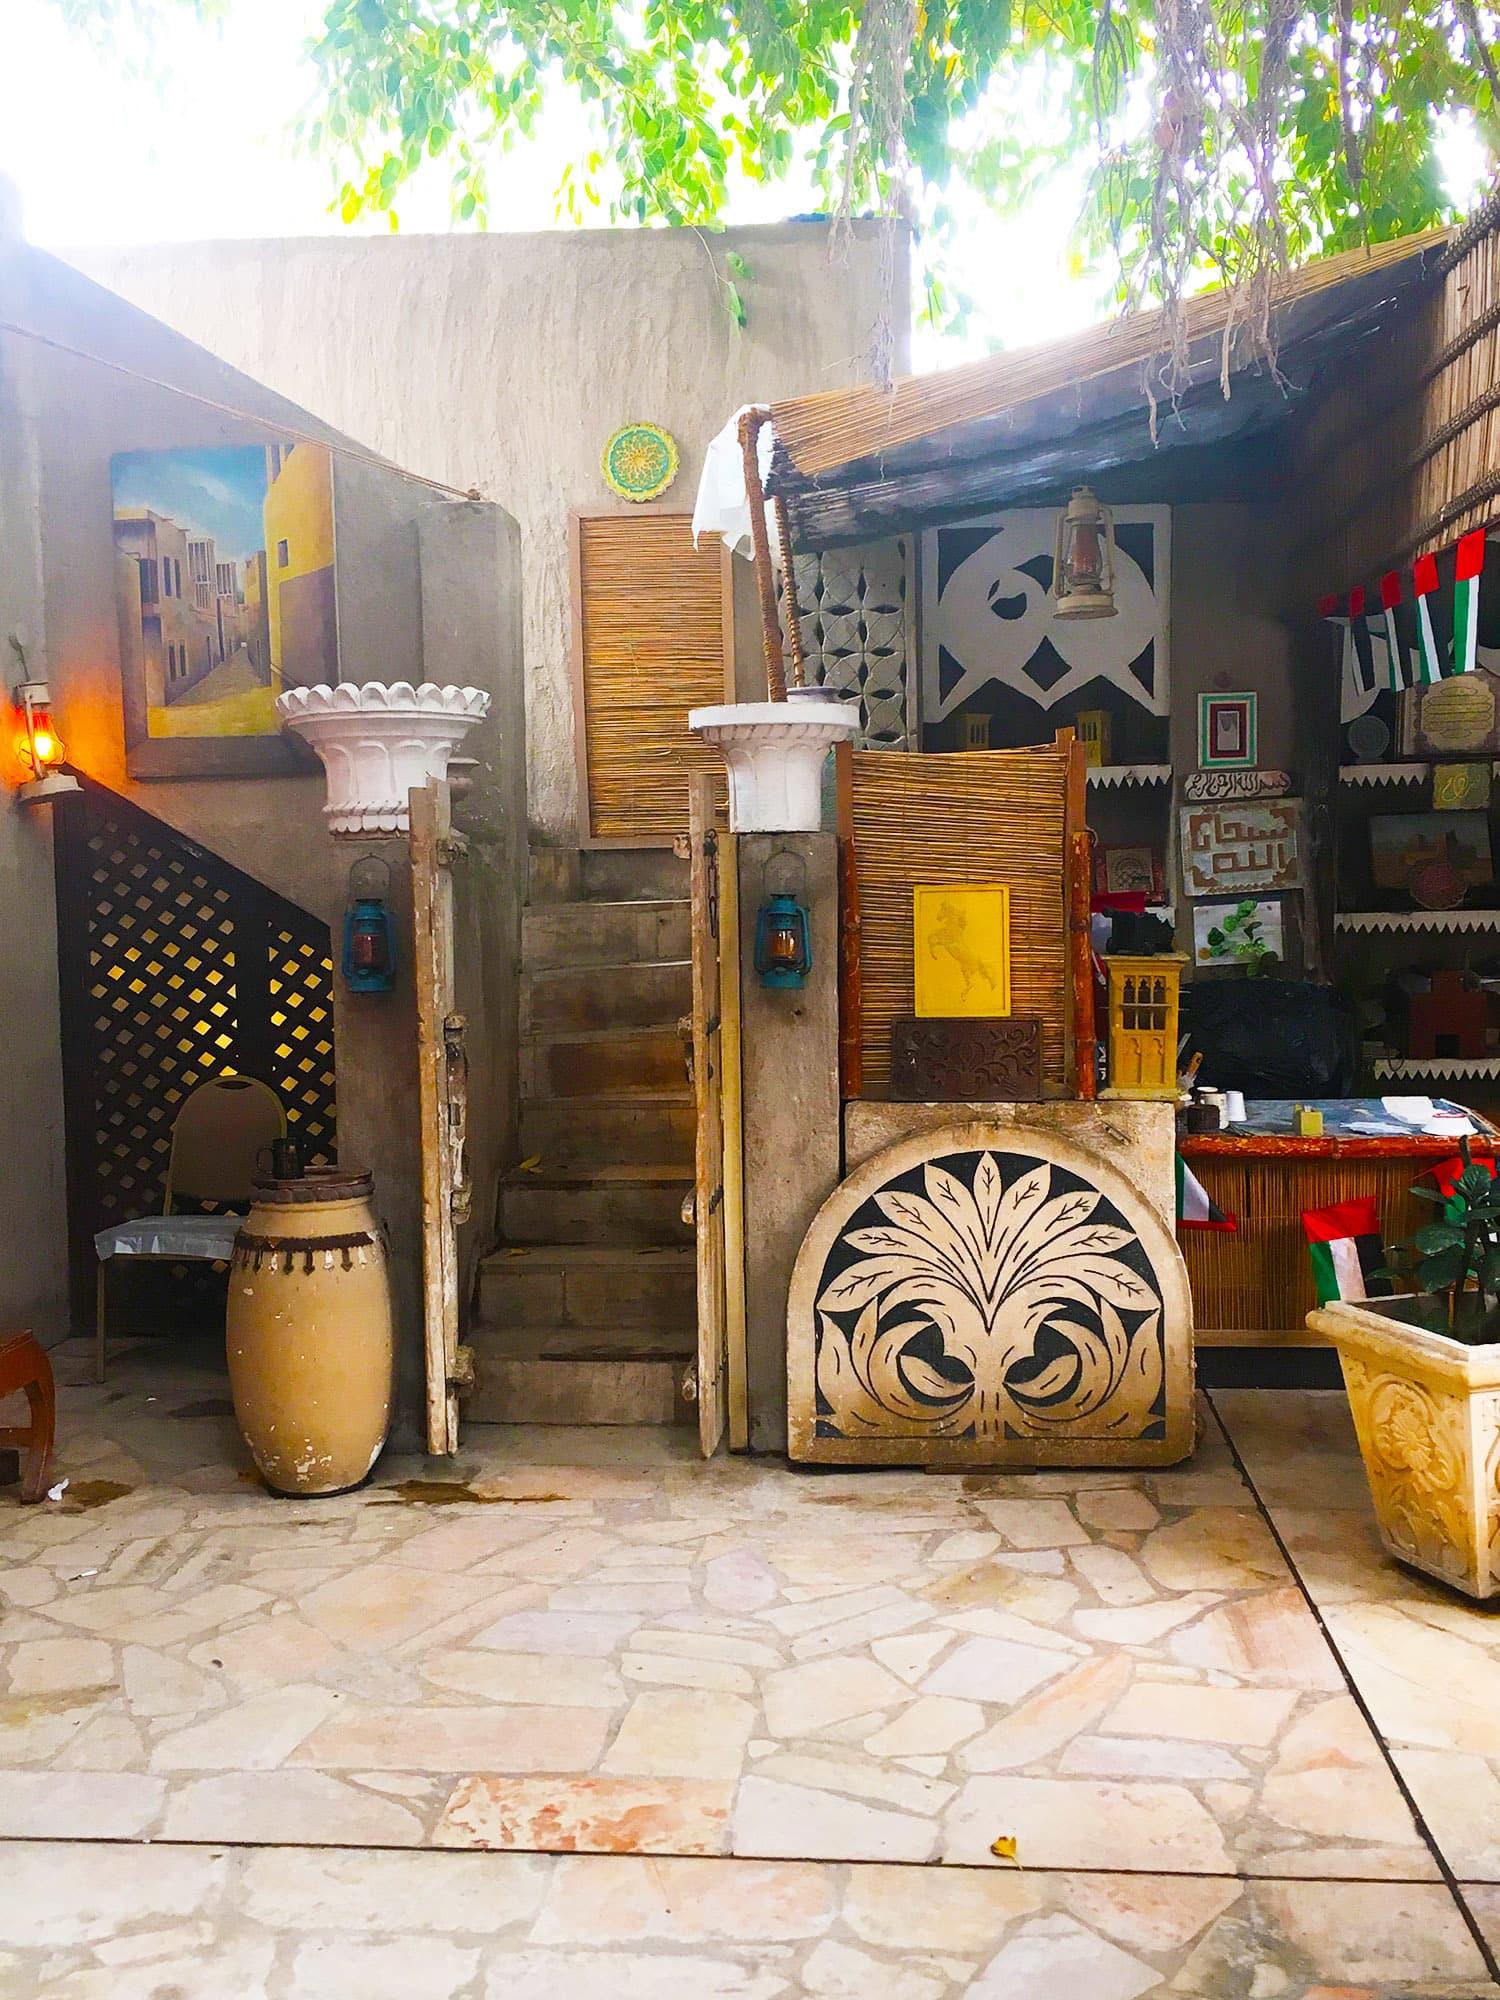 The Restoration House in Al Fahidi showcases historical artefacts.